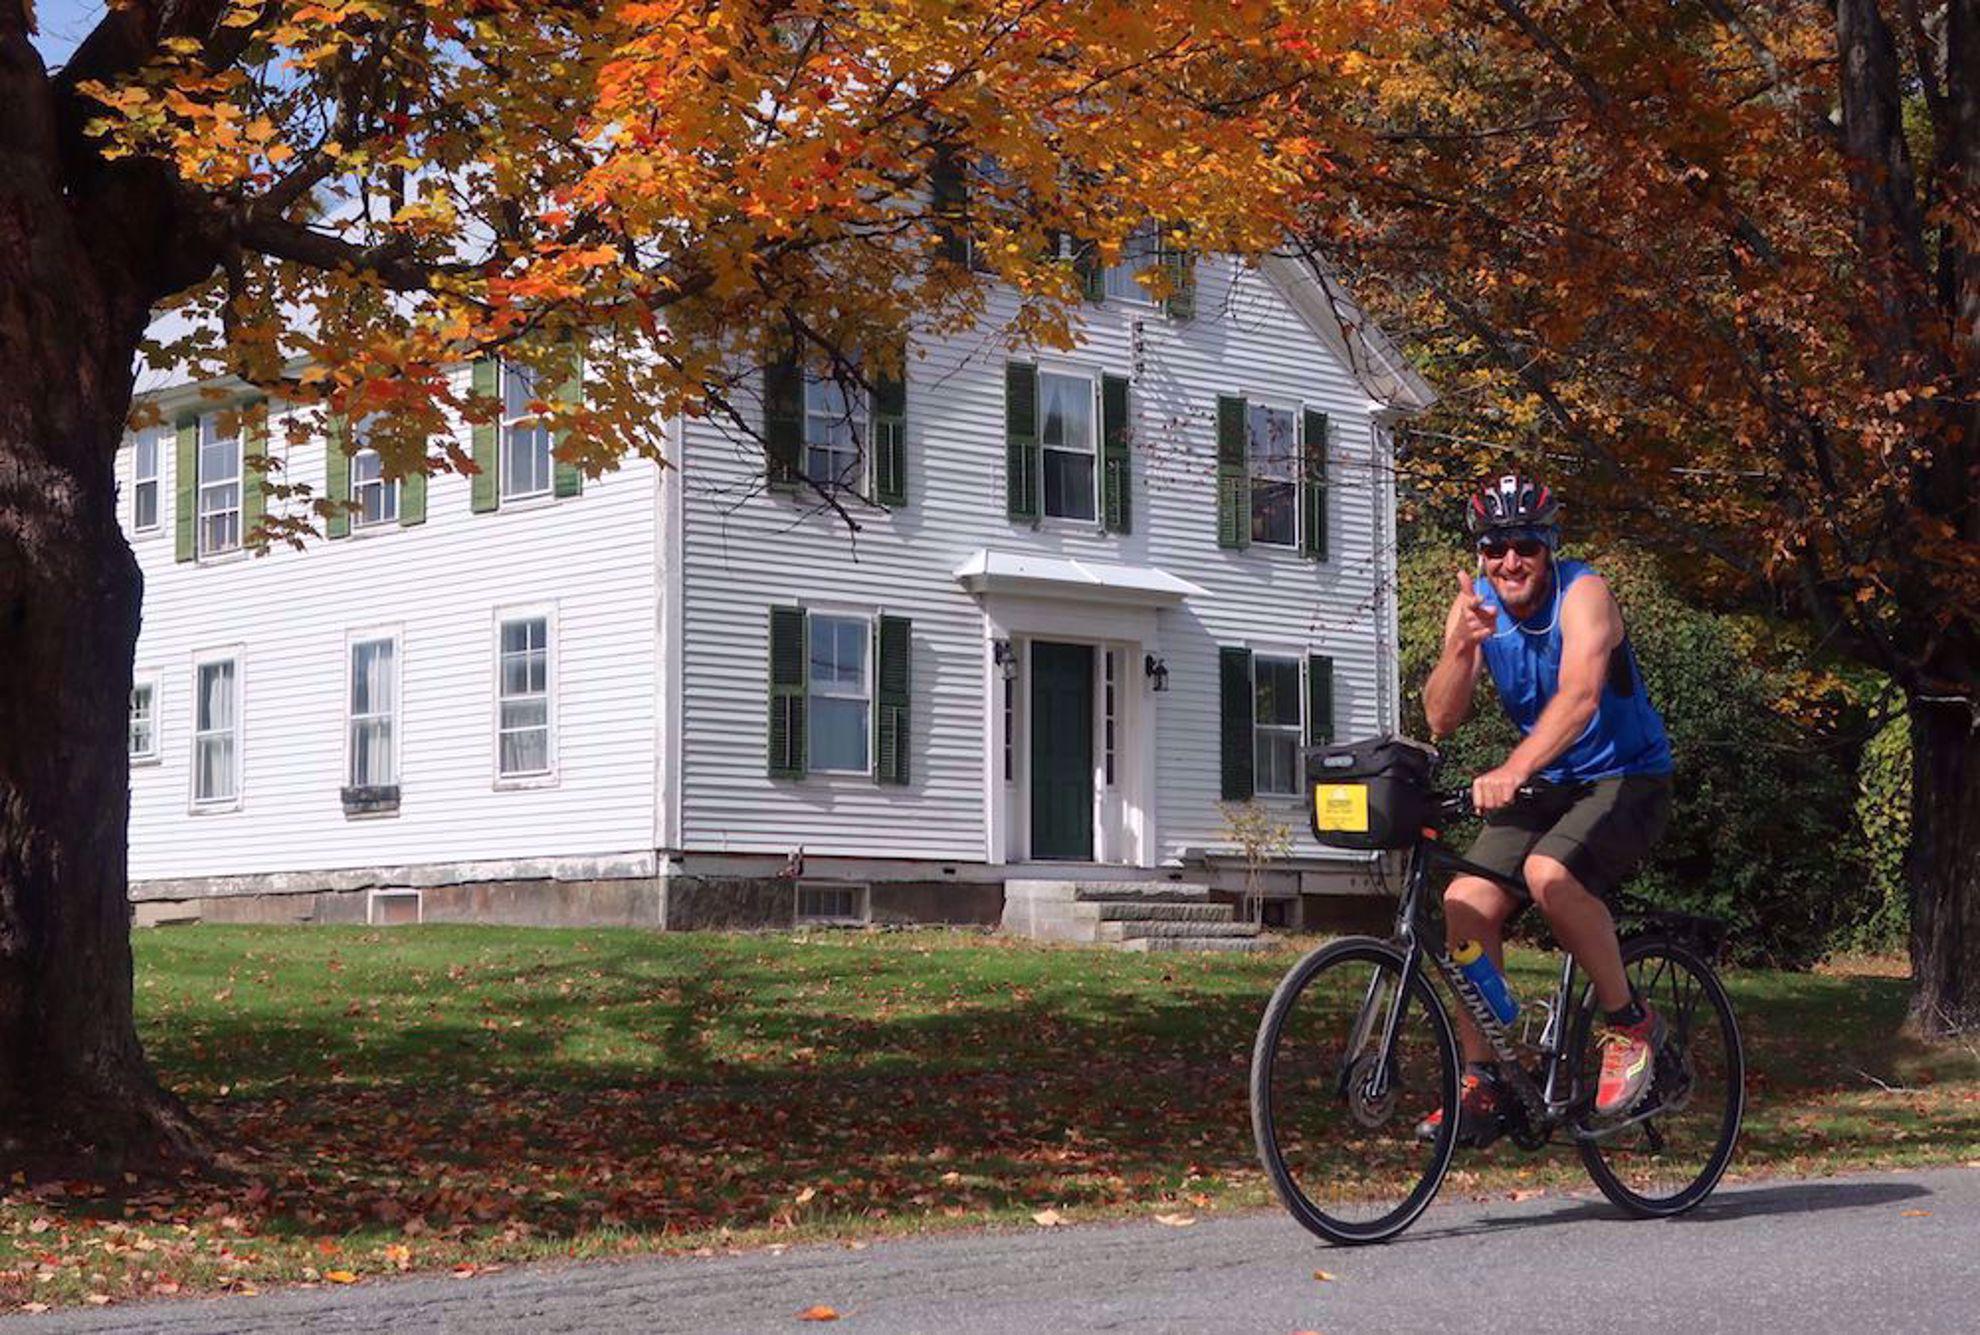 Biker near house Upper Valley